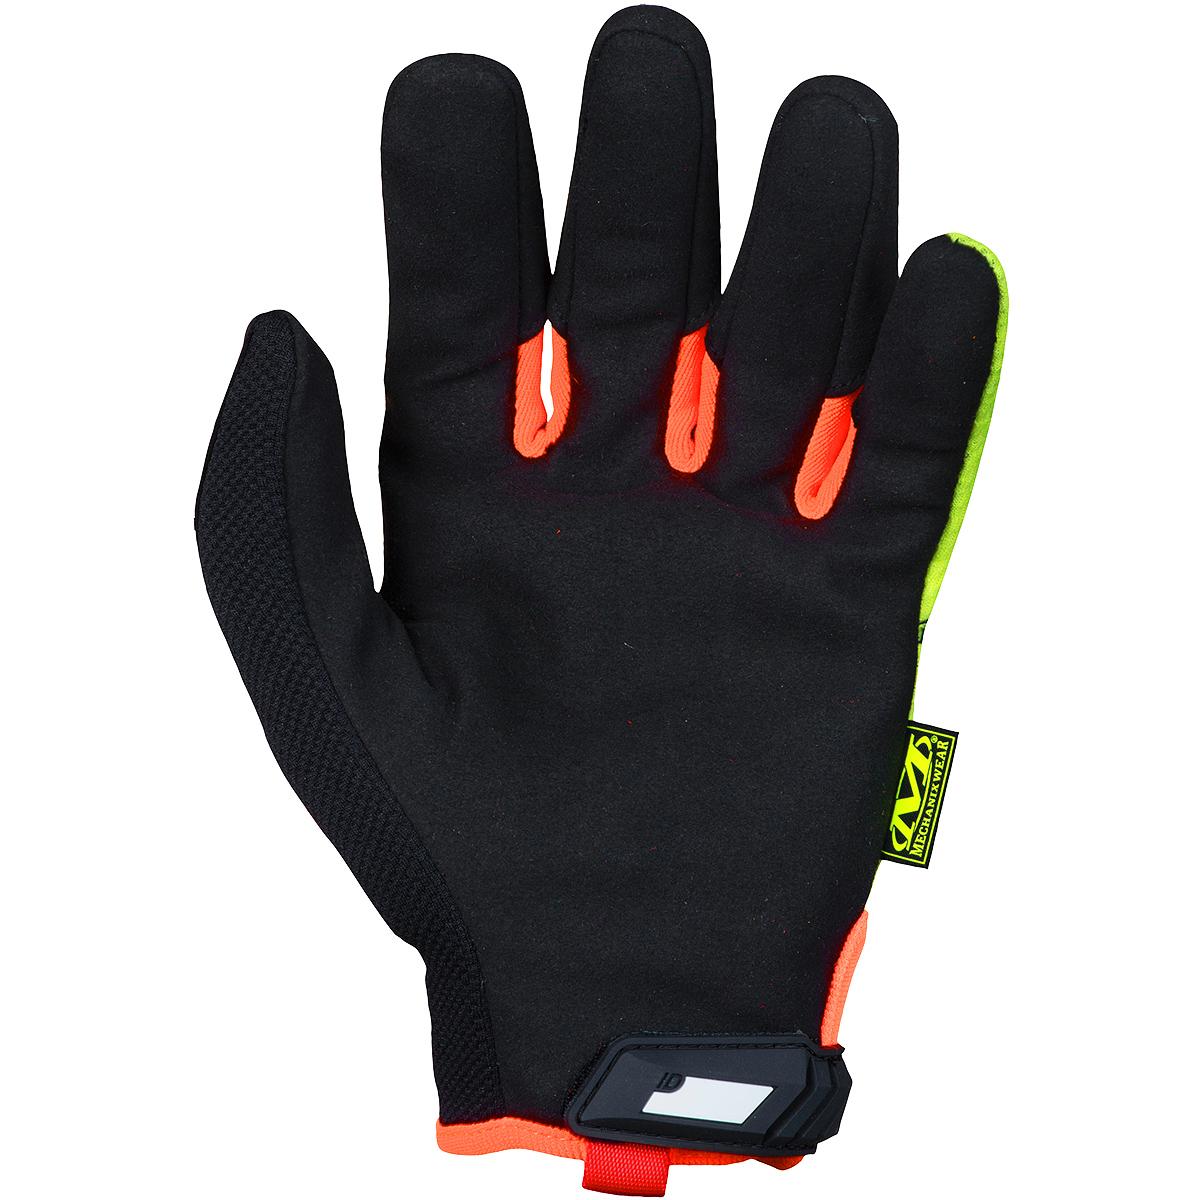 Mens yellow gloves - Sentinel Mechanix Wear Tactical Mens Cr5 Original Gloves Hi Viz Safety Work Glove Yellow